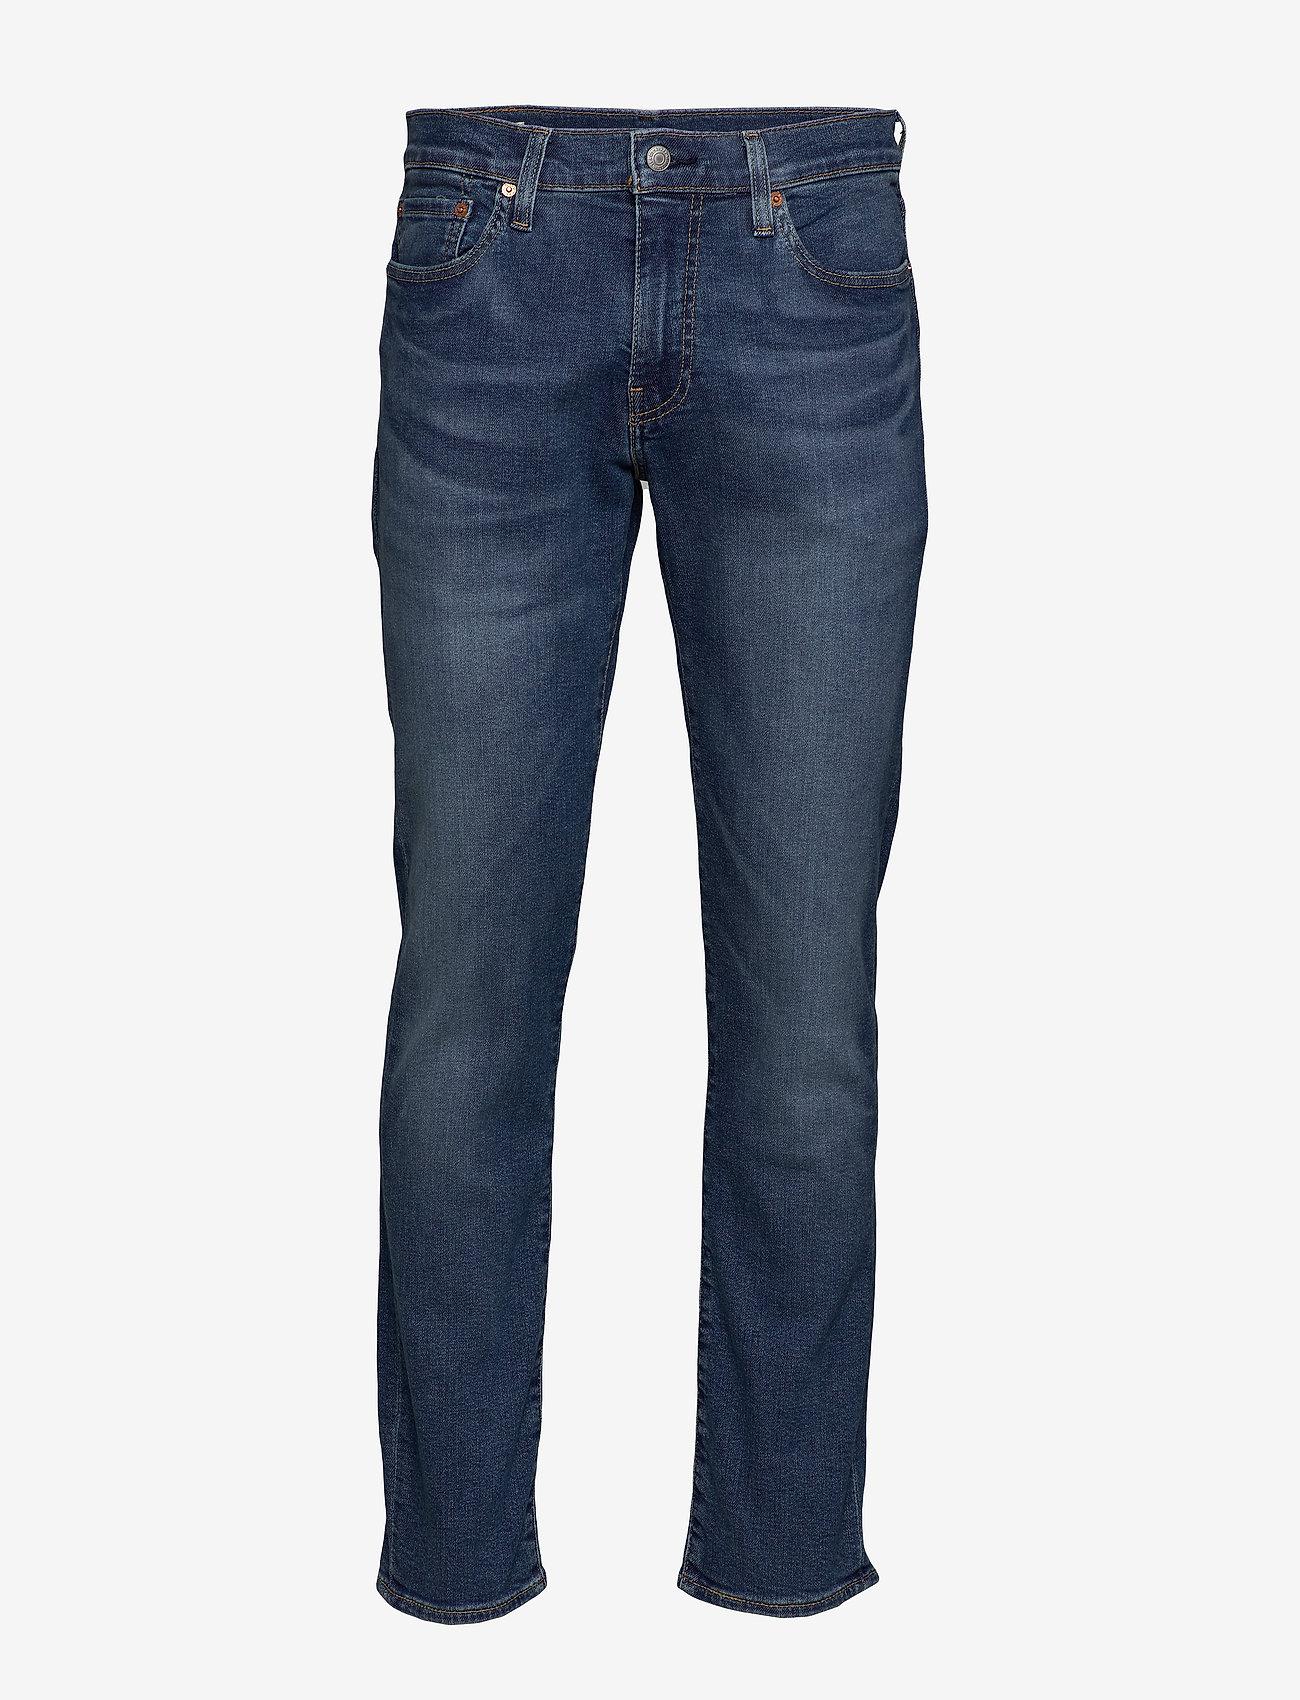 LEVI´S Men - 511 SLIM CEDAR NEST ADV - slim jeans - med indigo - flat finish - 0